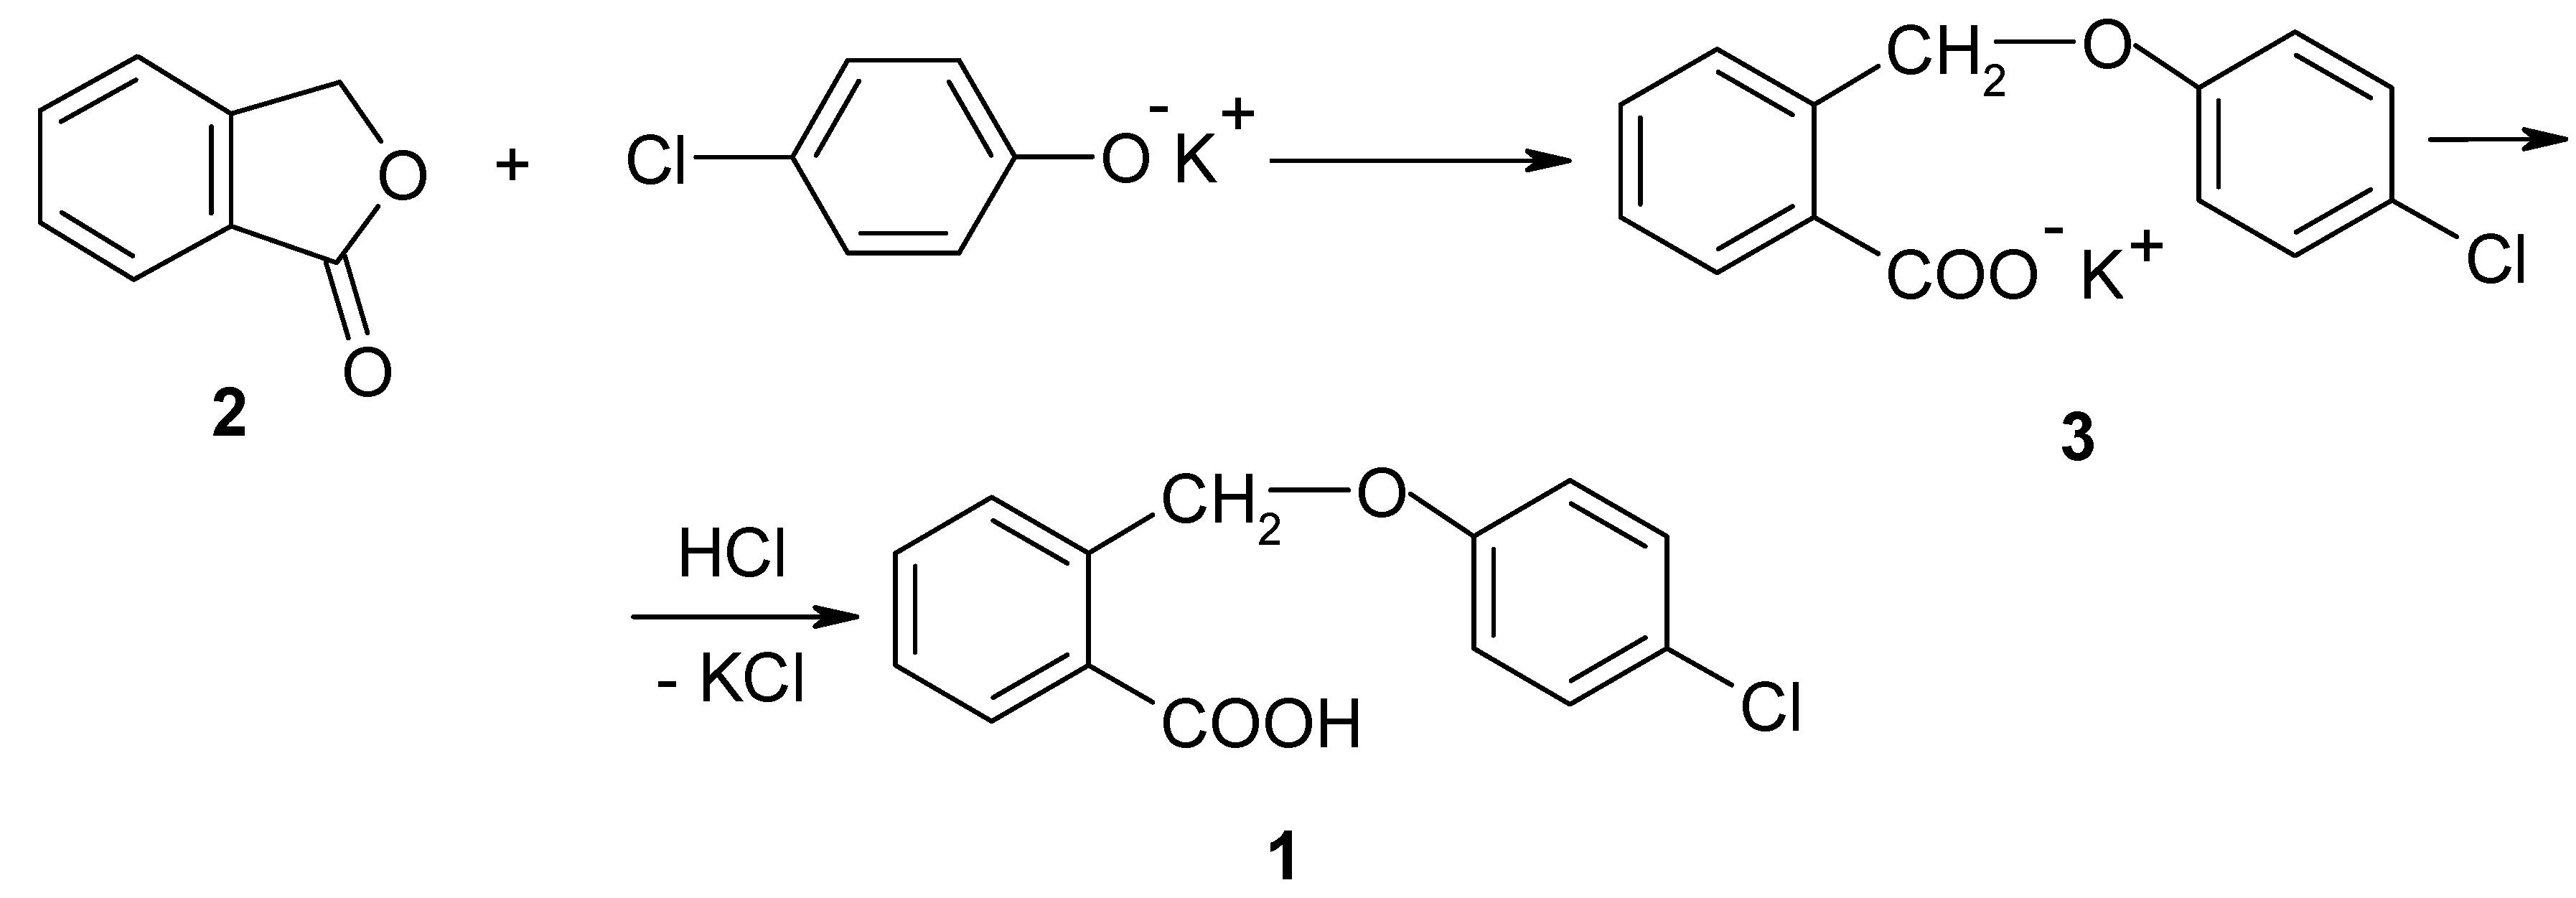 benzoic acid Benzoic acid, benzoic acid supplier, benzoic acid distributor, cas 65-85-0, benzoic acid manufacturer, benzoic acid wholesale.